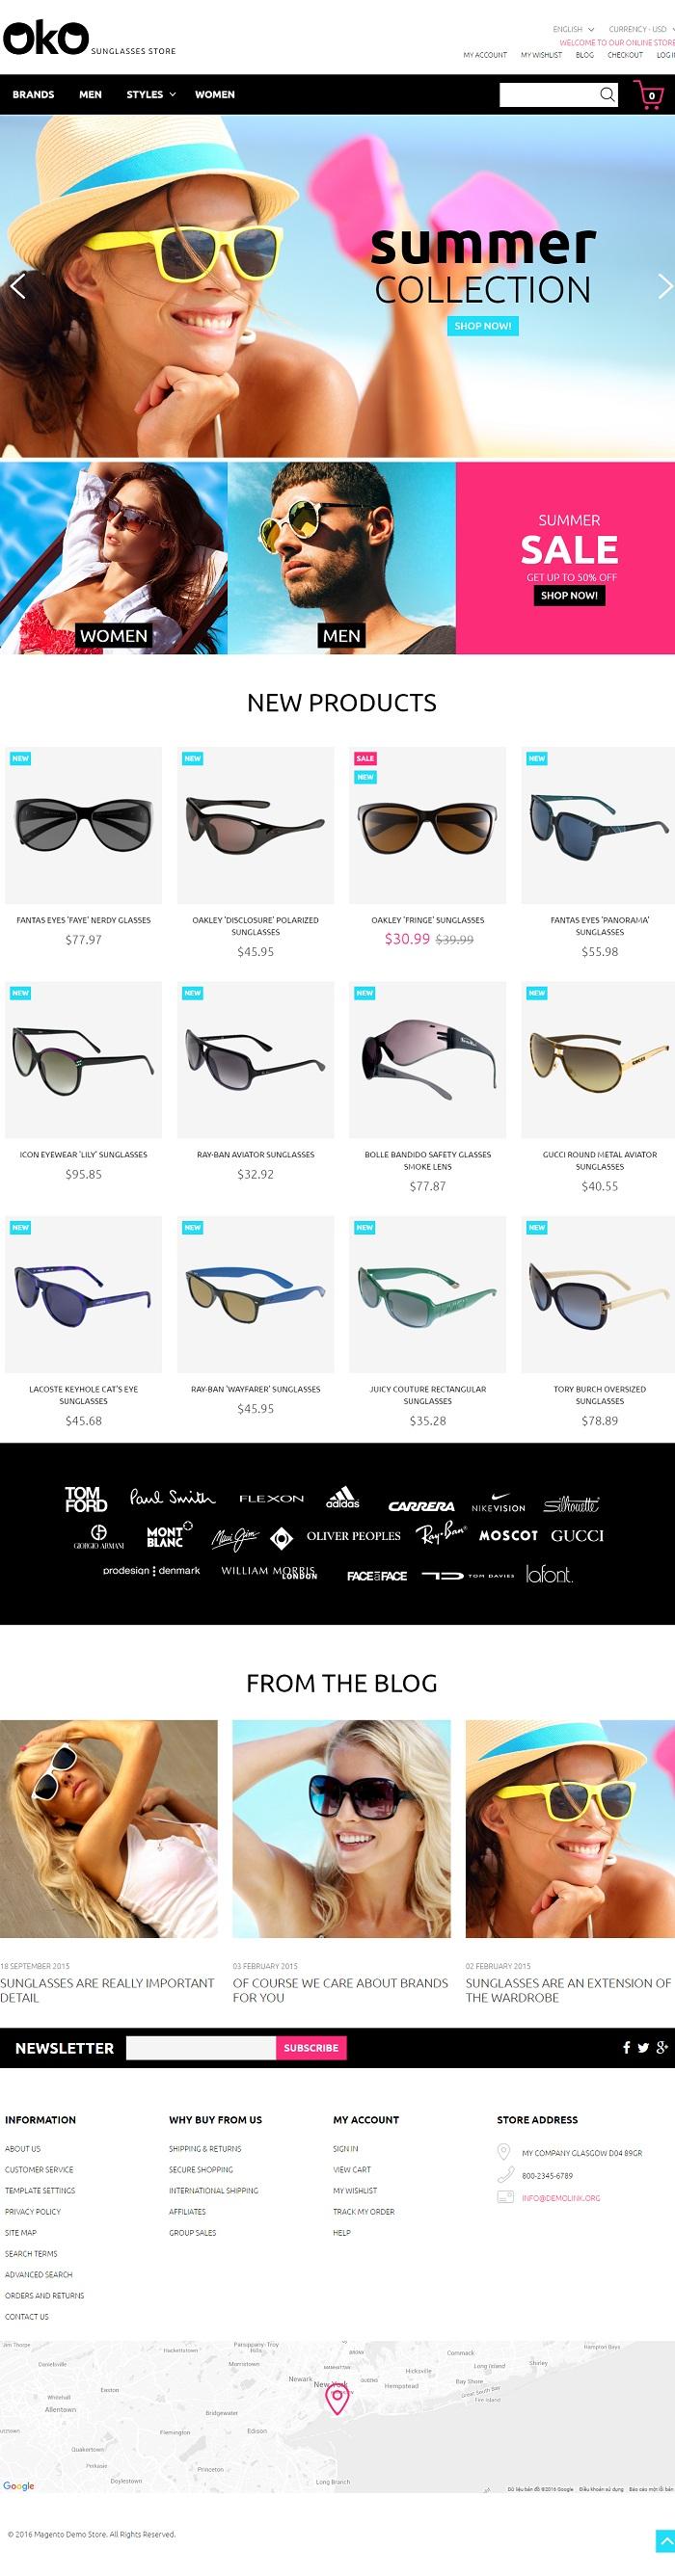 Website Kính mắt thời trang